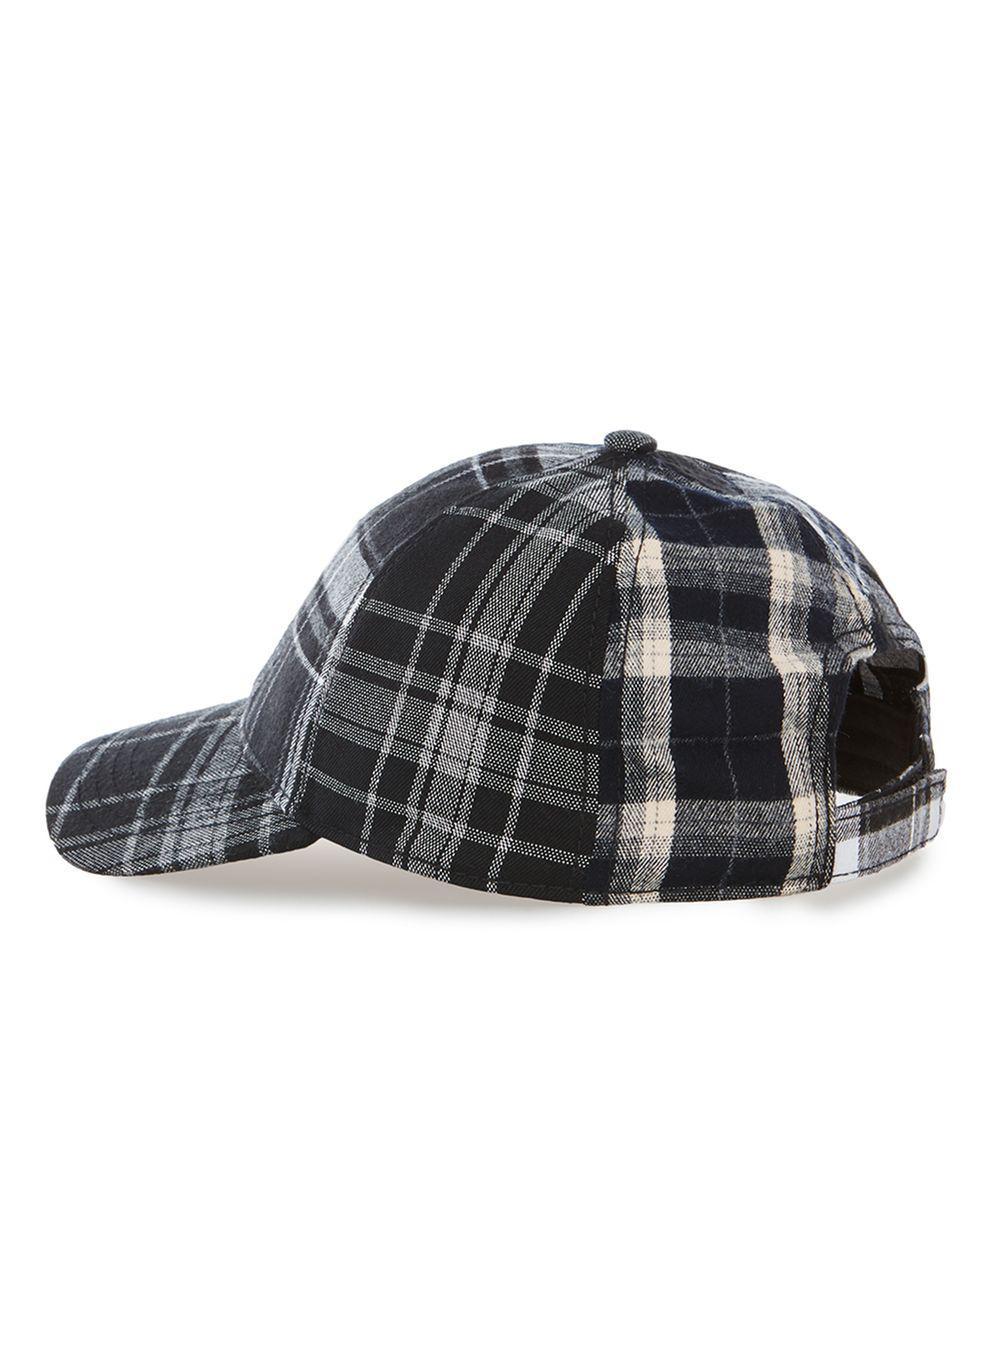 332893c6074 Lyst - TOPMAN Black Check Curve Peak Cap in Black for Men